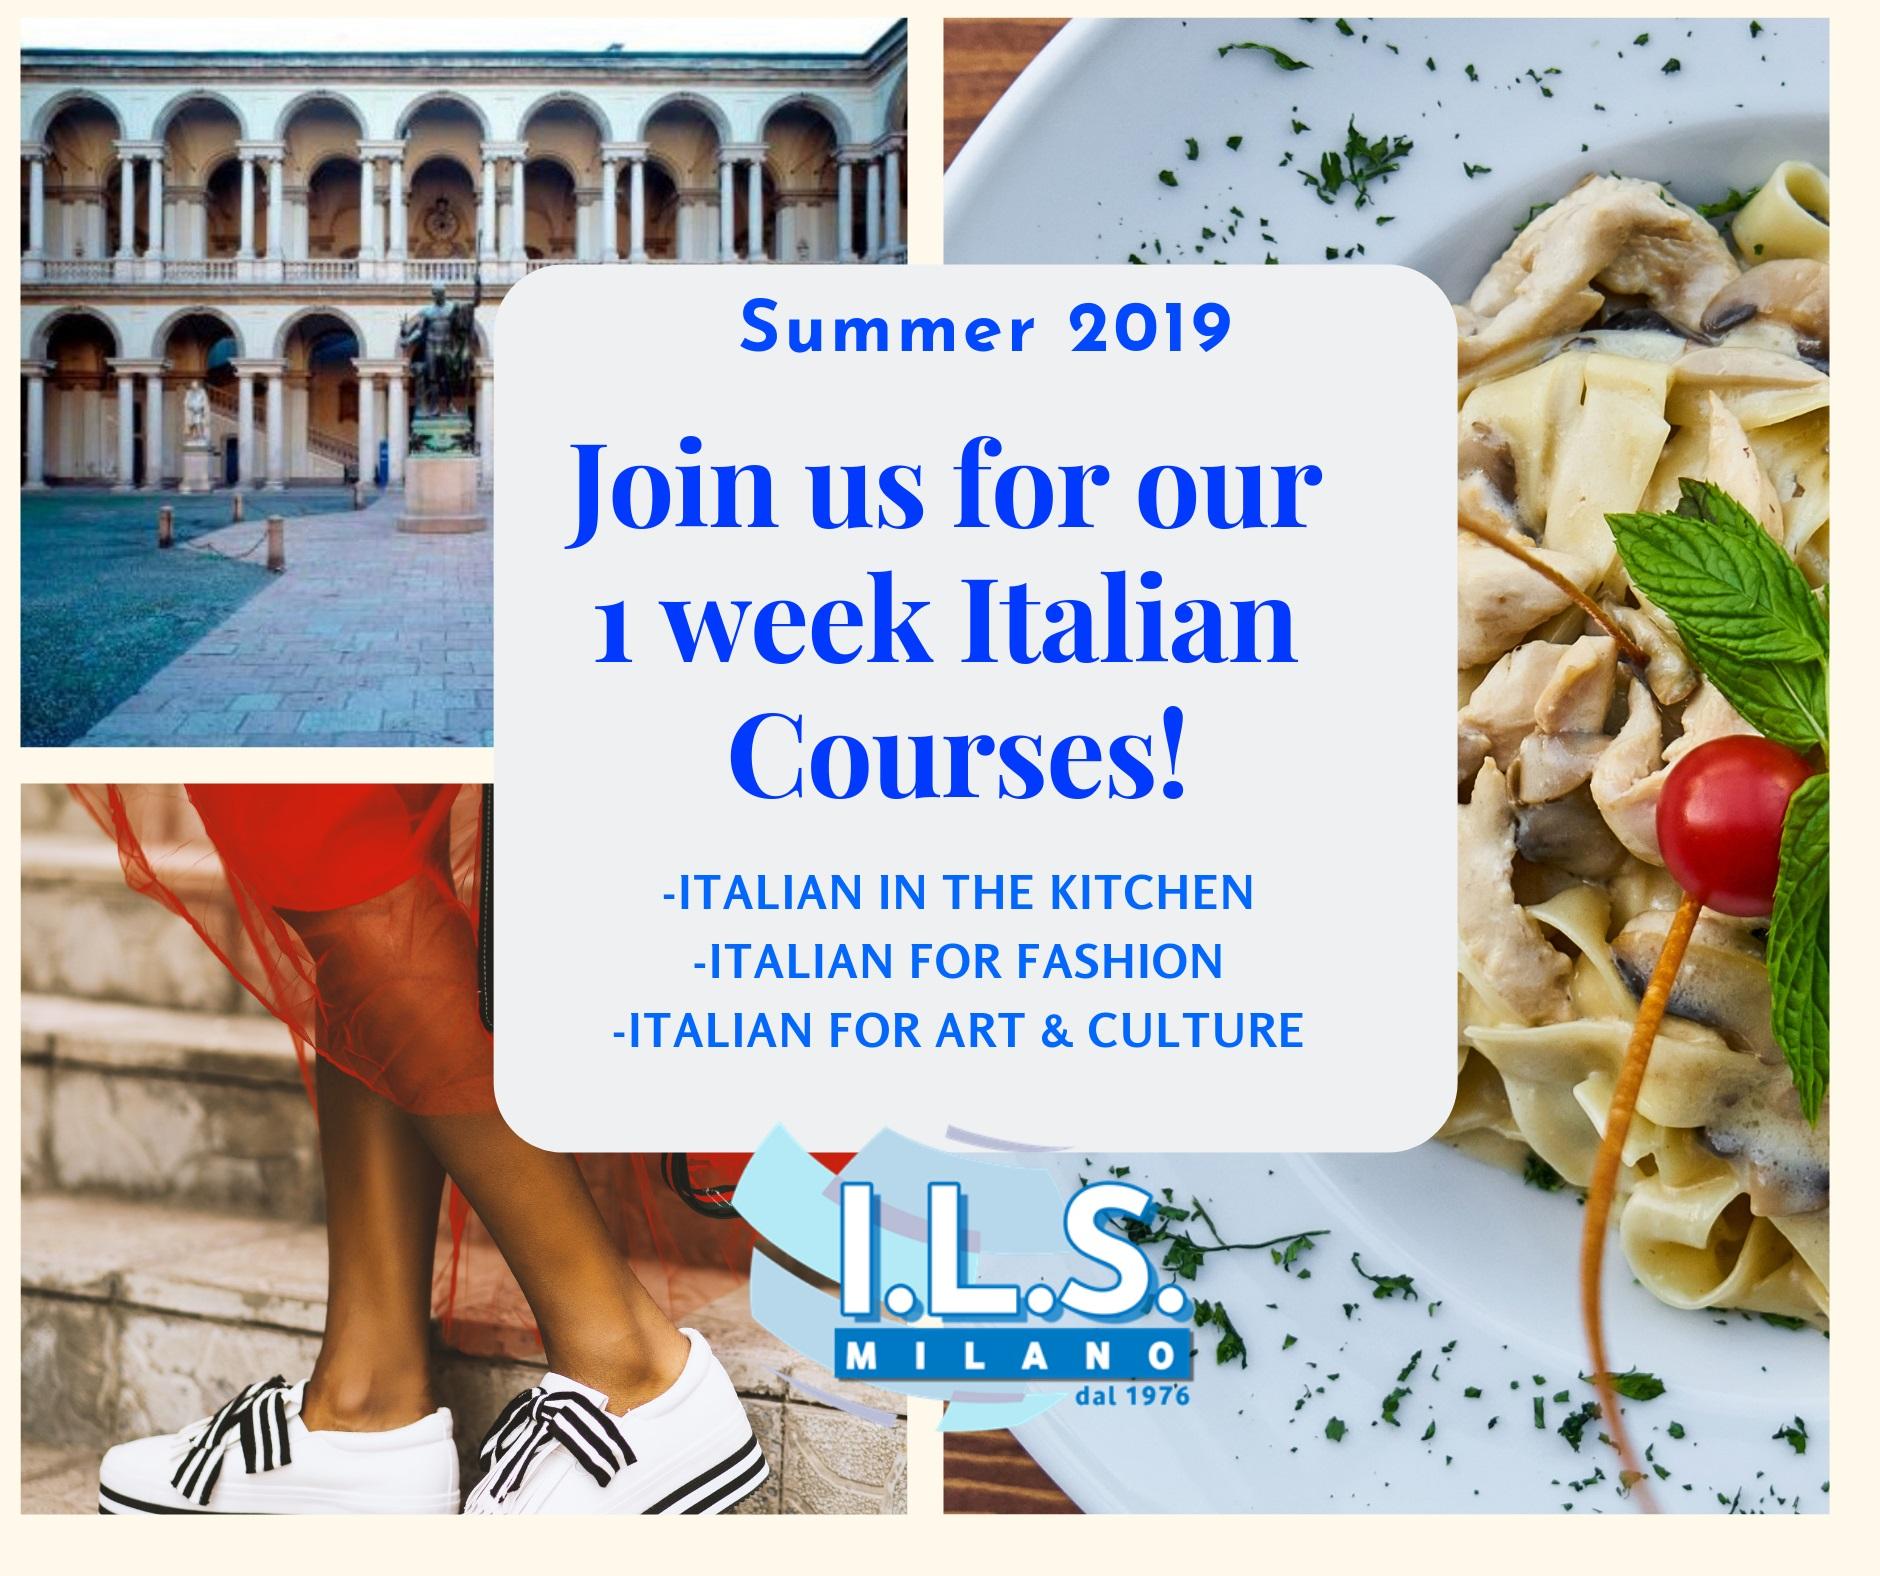 Italian 1 week courses ils milano italian language summer course learn italian in milan fashion art food